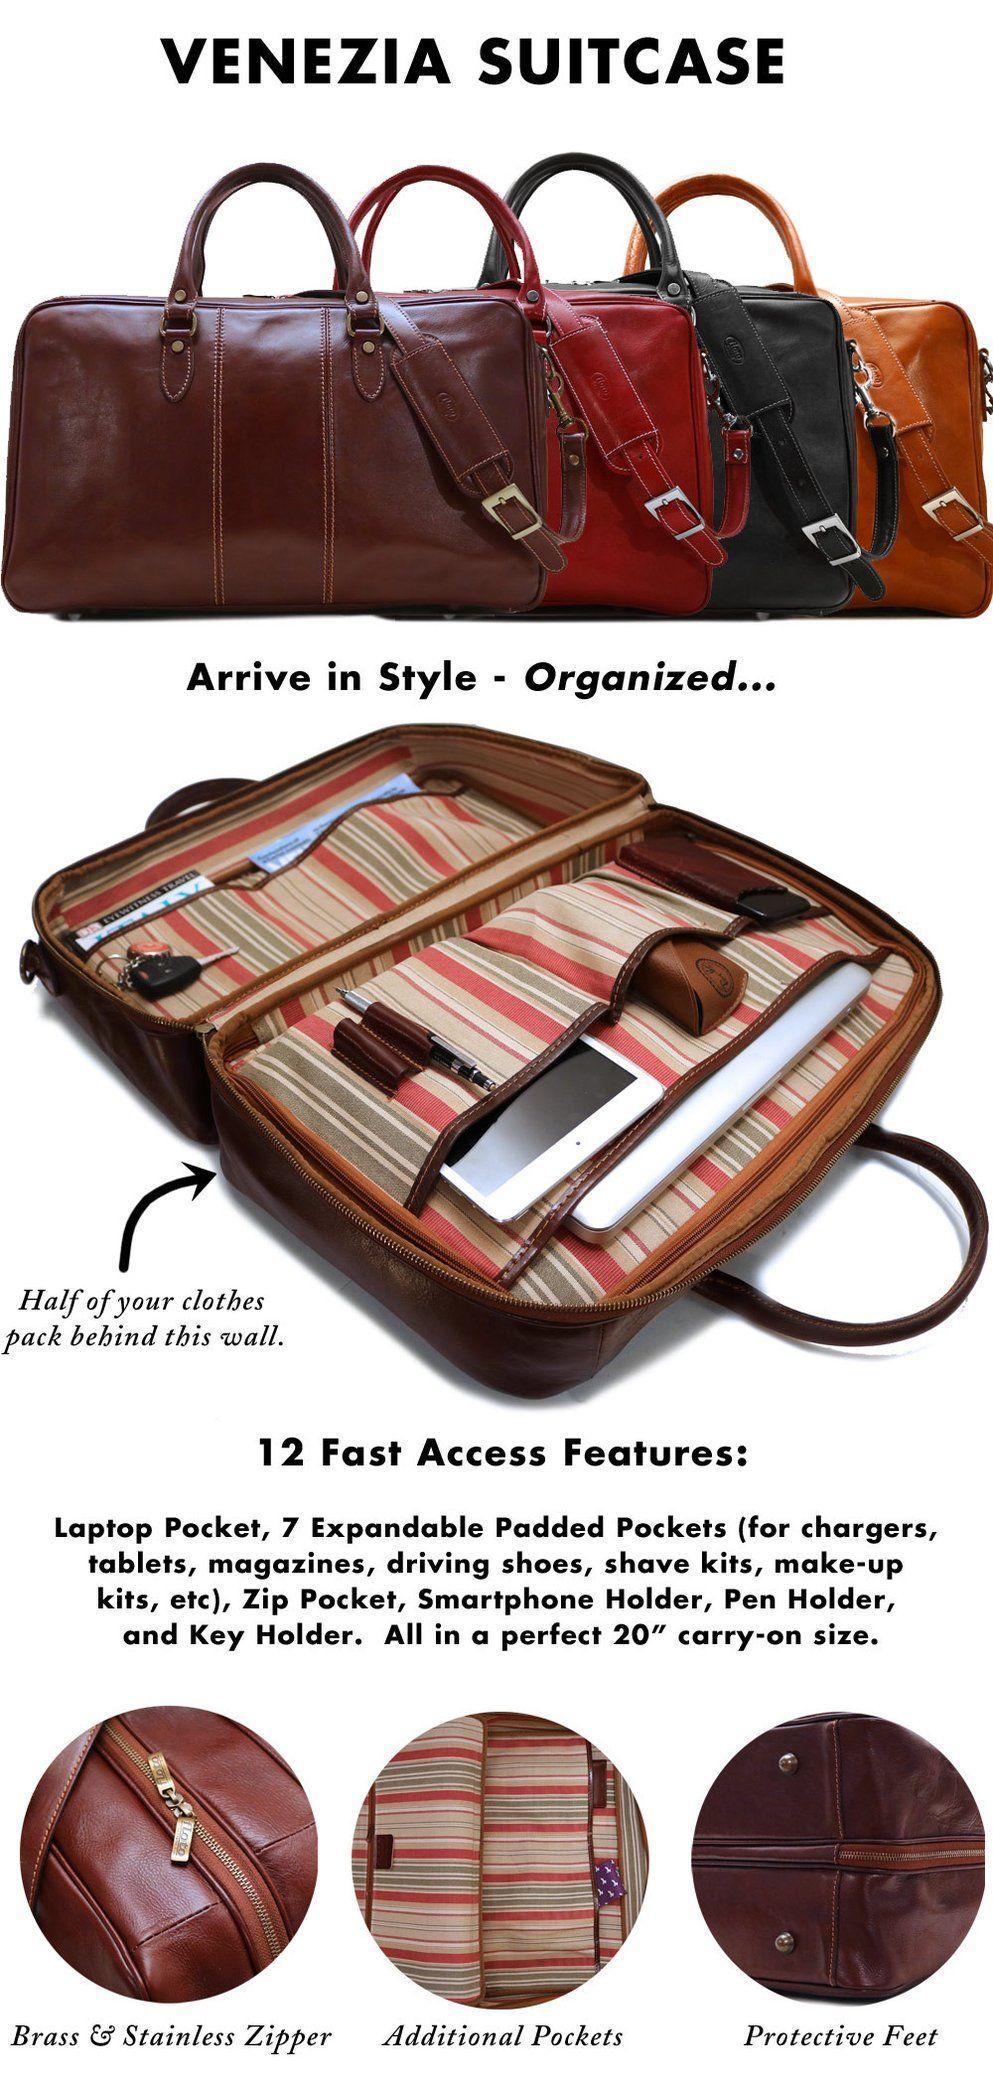 6f95e669fe8d Venezia Suitcase Duffle Bag | Pika na i | Bags, Travel bags, Leather ...